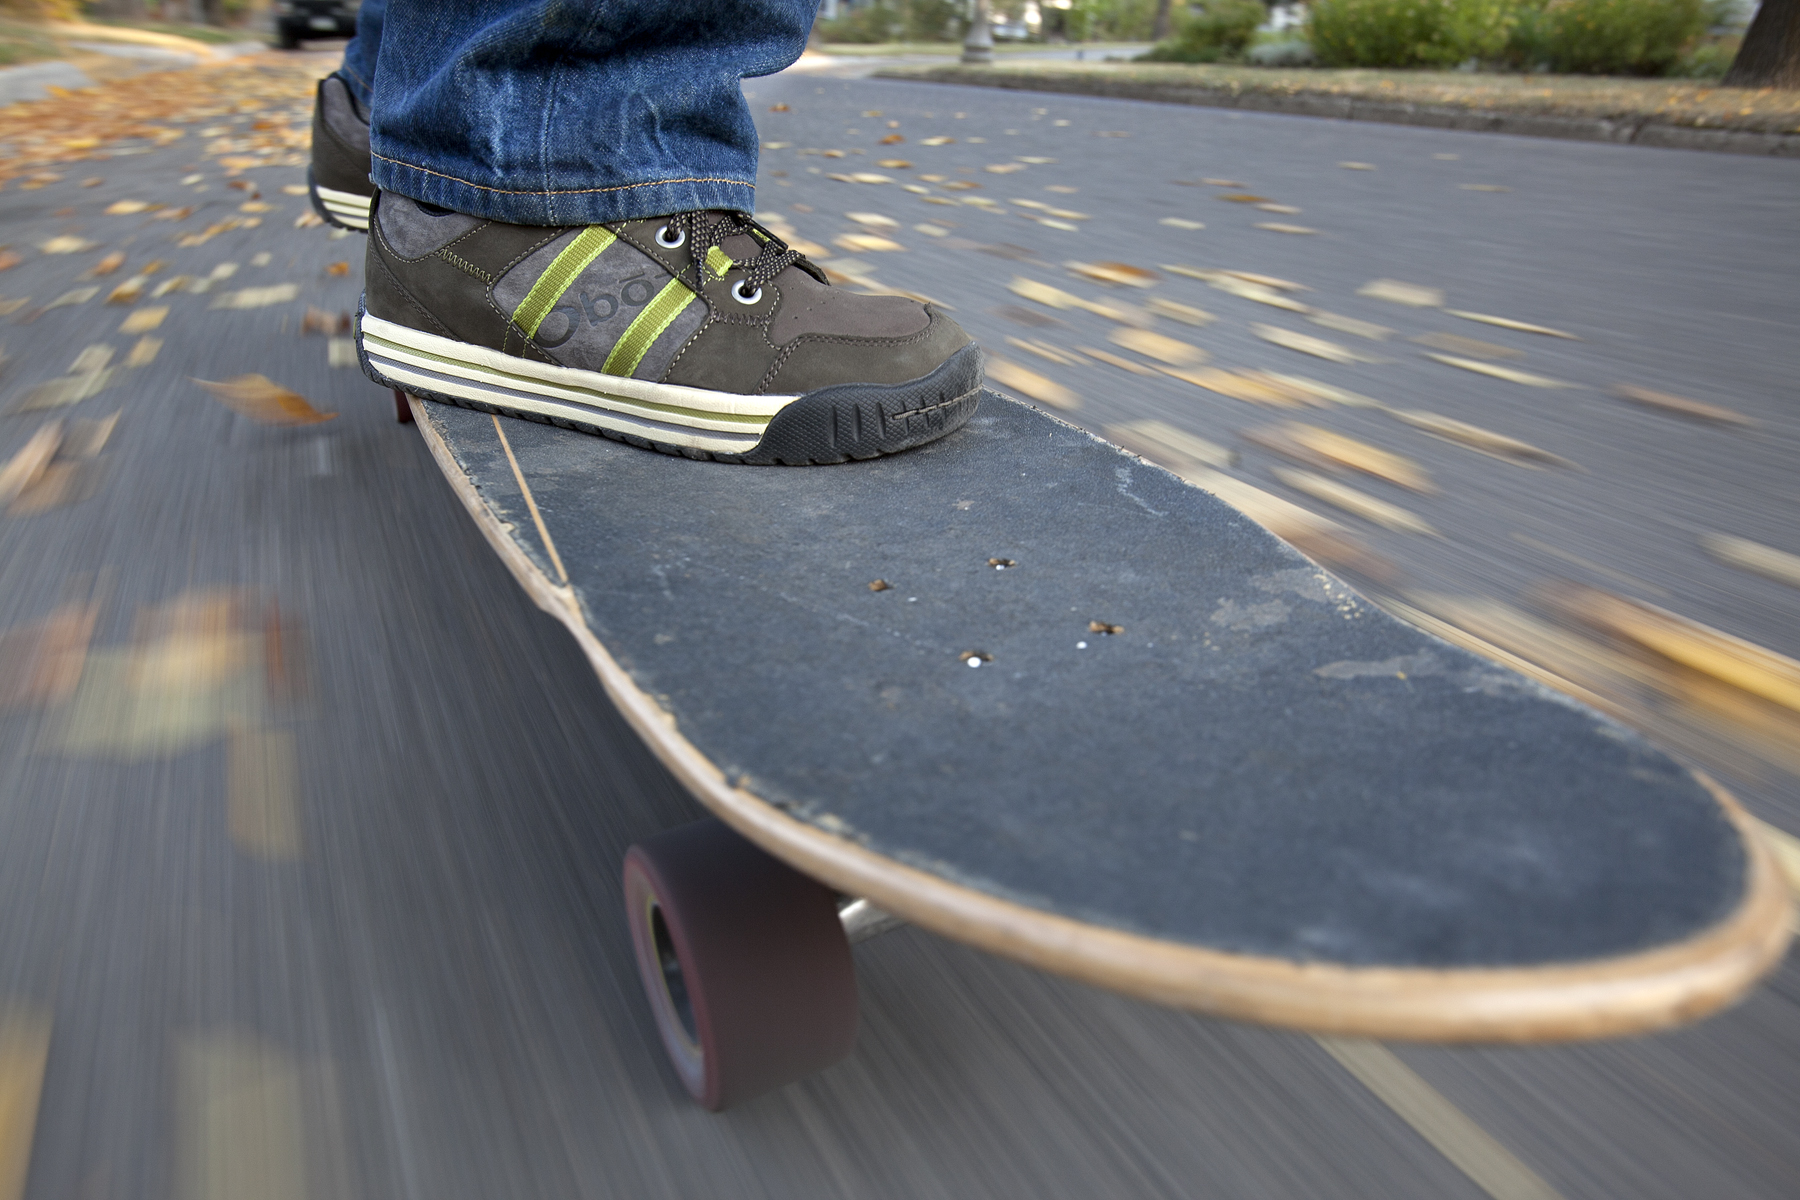 Man_Skateboarding_POV_feet